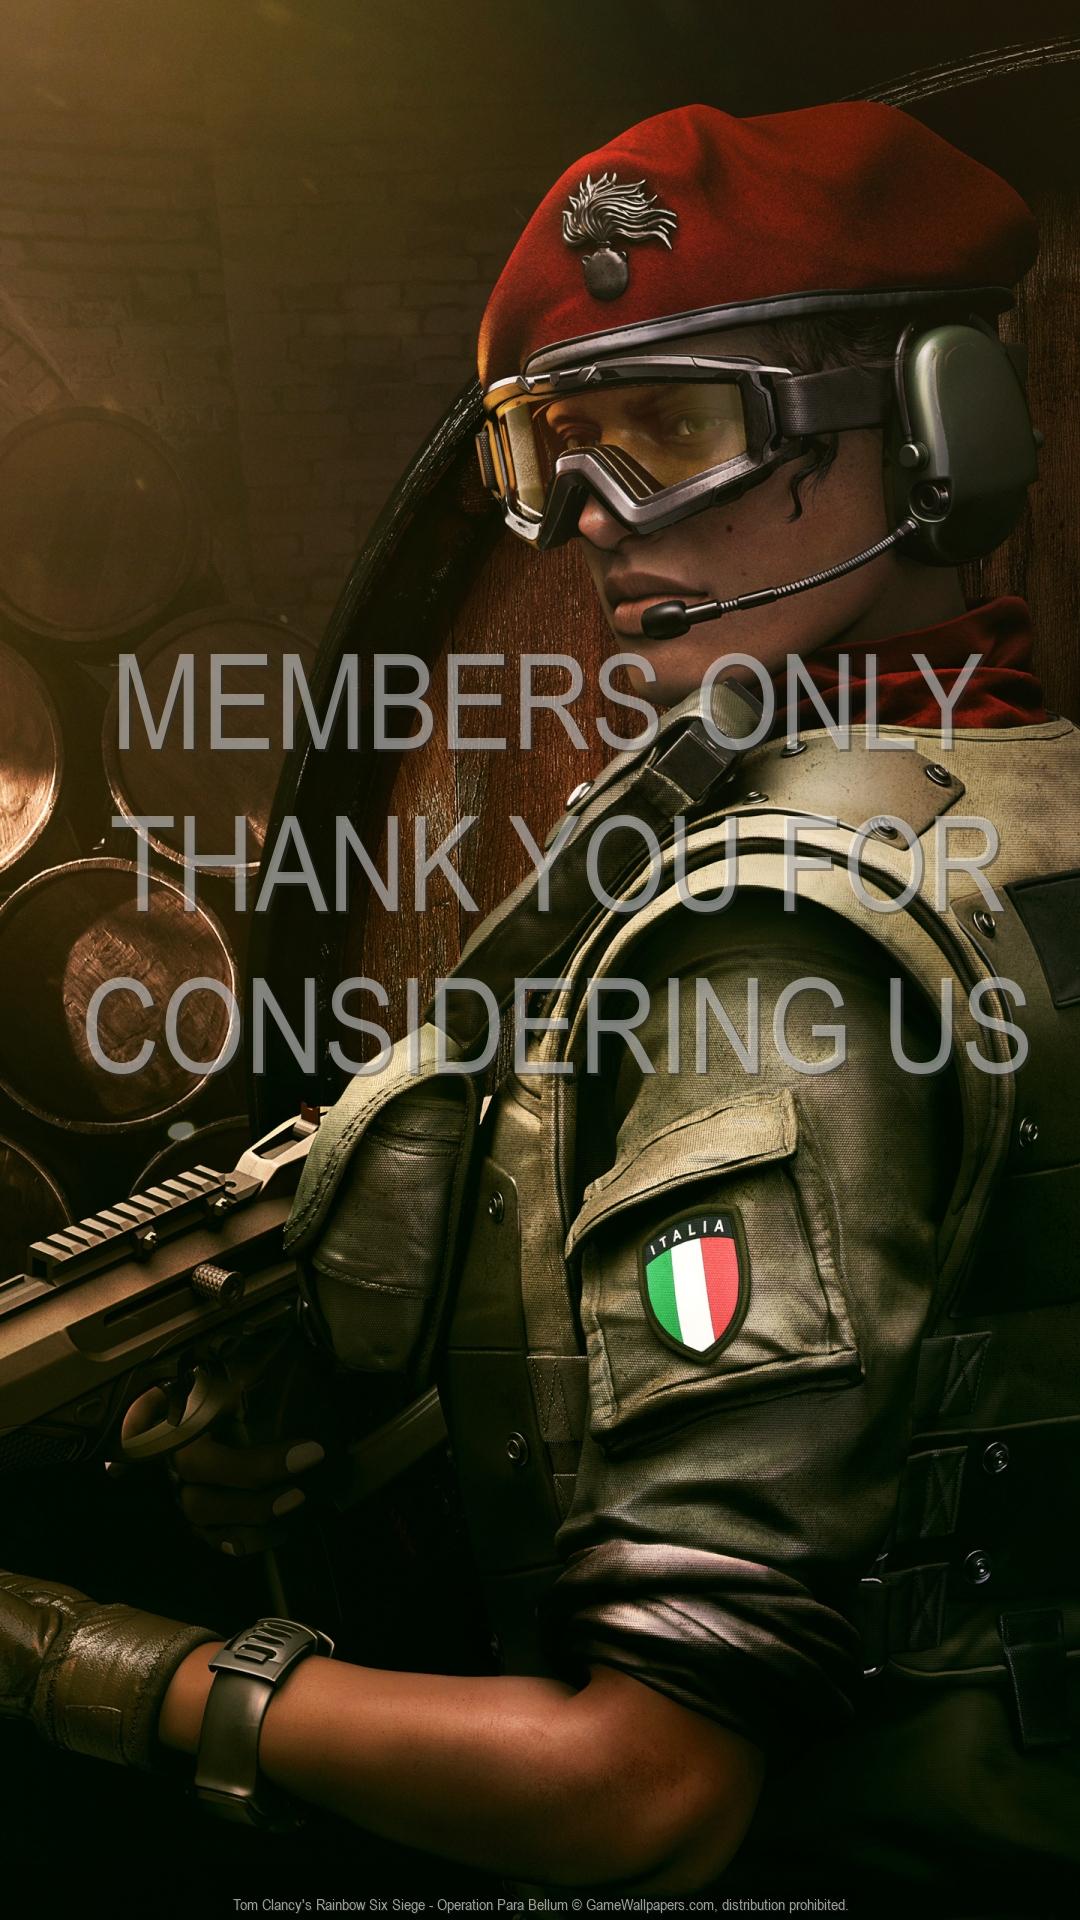 Tom Clancy's Rainbow Six: Siege - Operation Para Bellum 1920x1080 Mobiele achtergrond 02